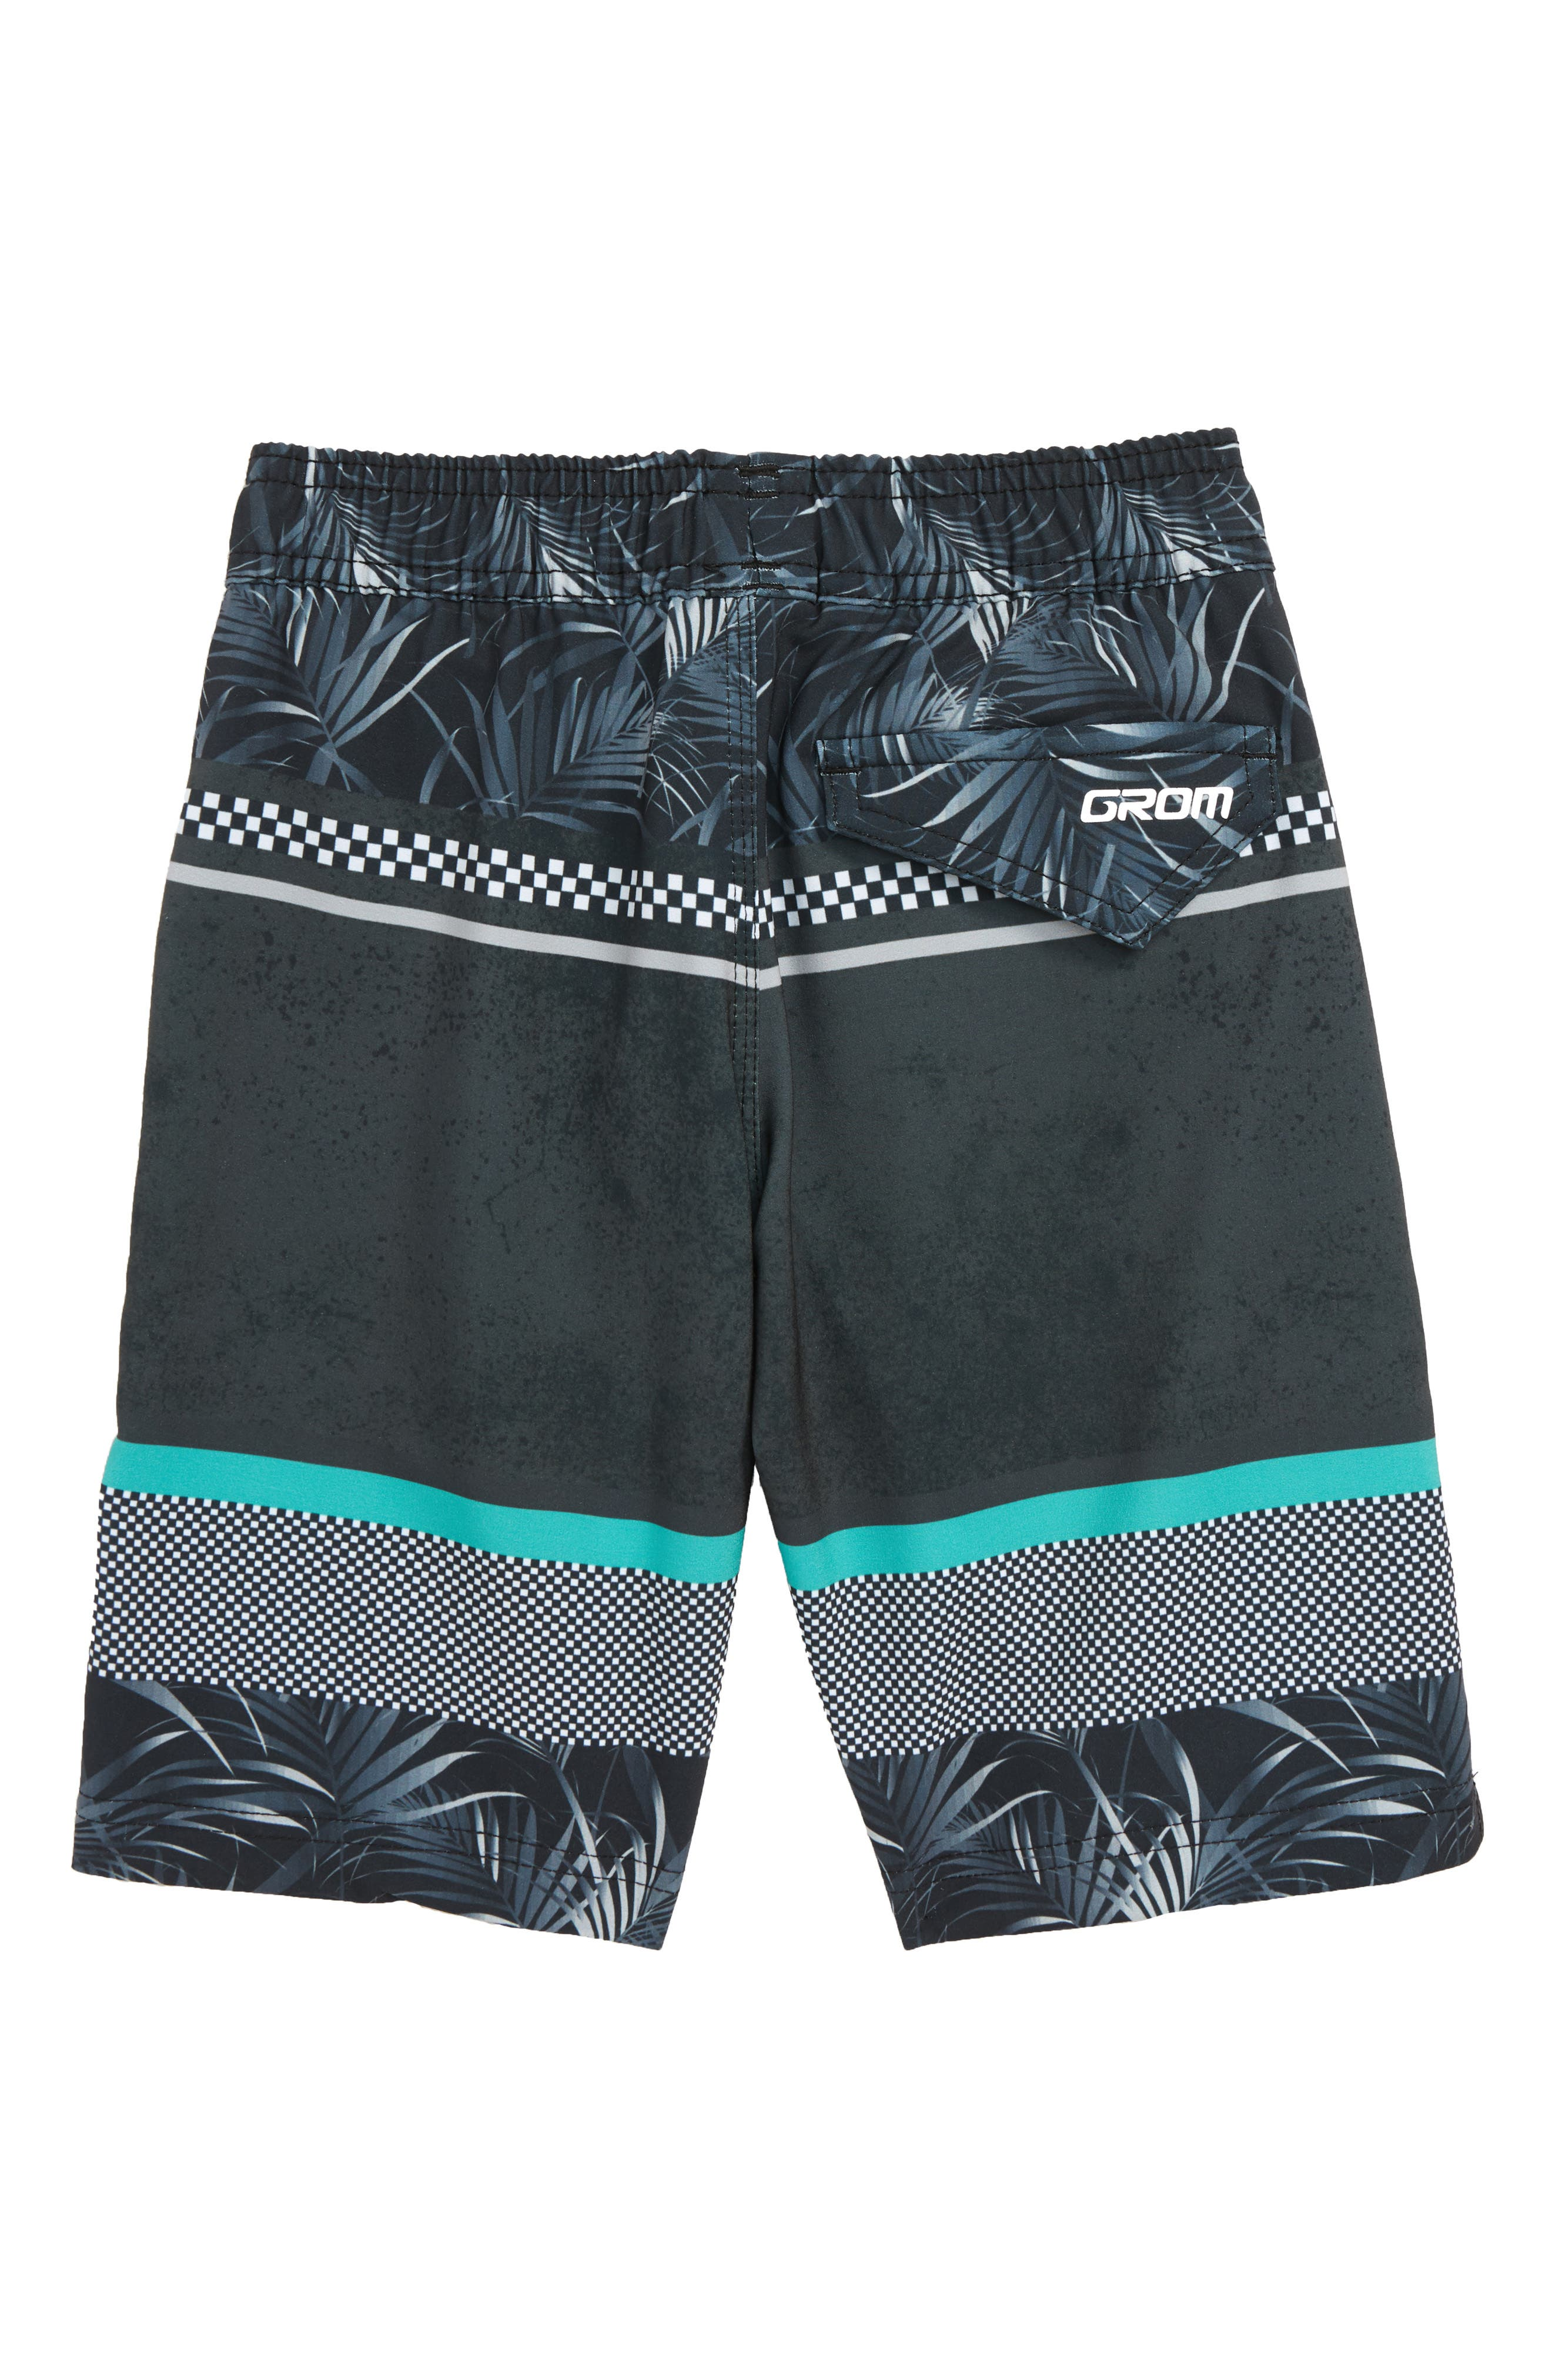 Beachbreak Board Shorts,                             Alternate thumbnail 2, color,                             001